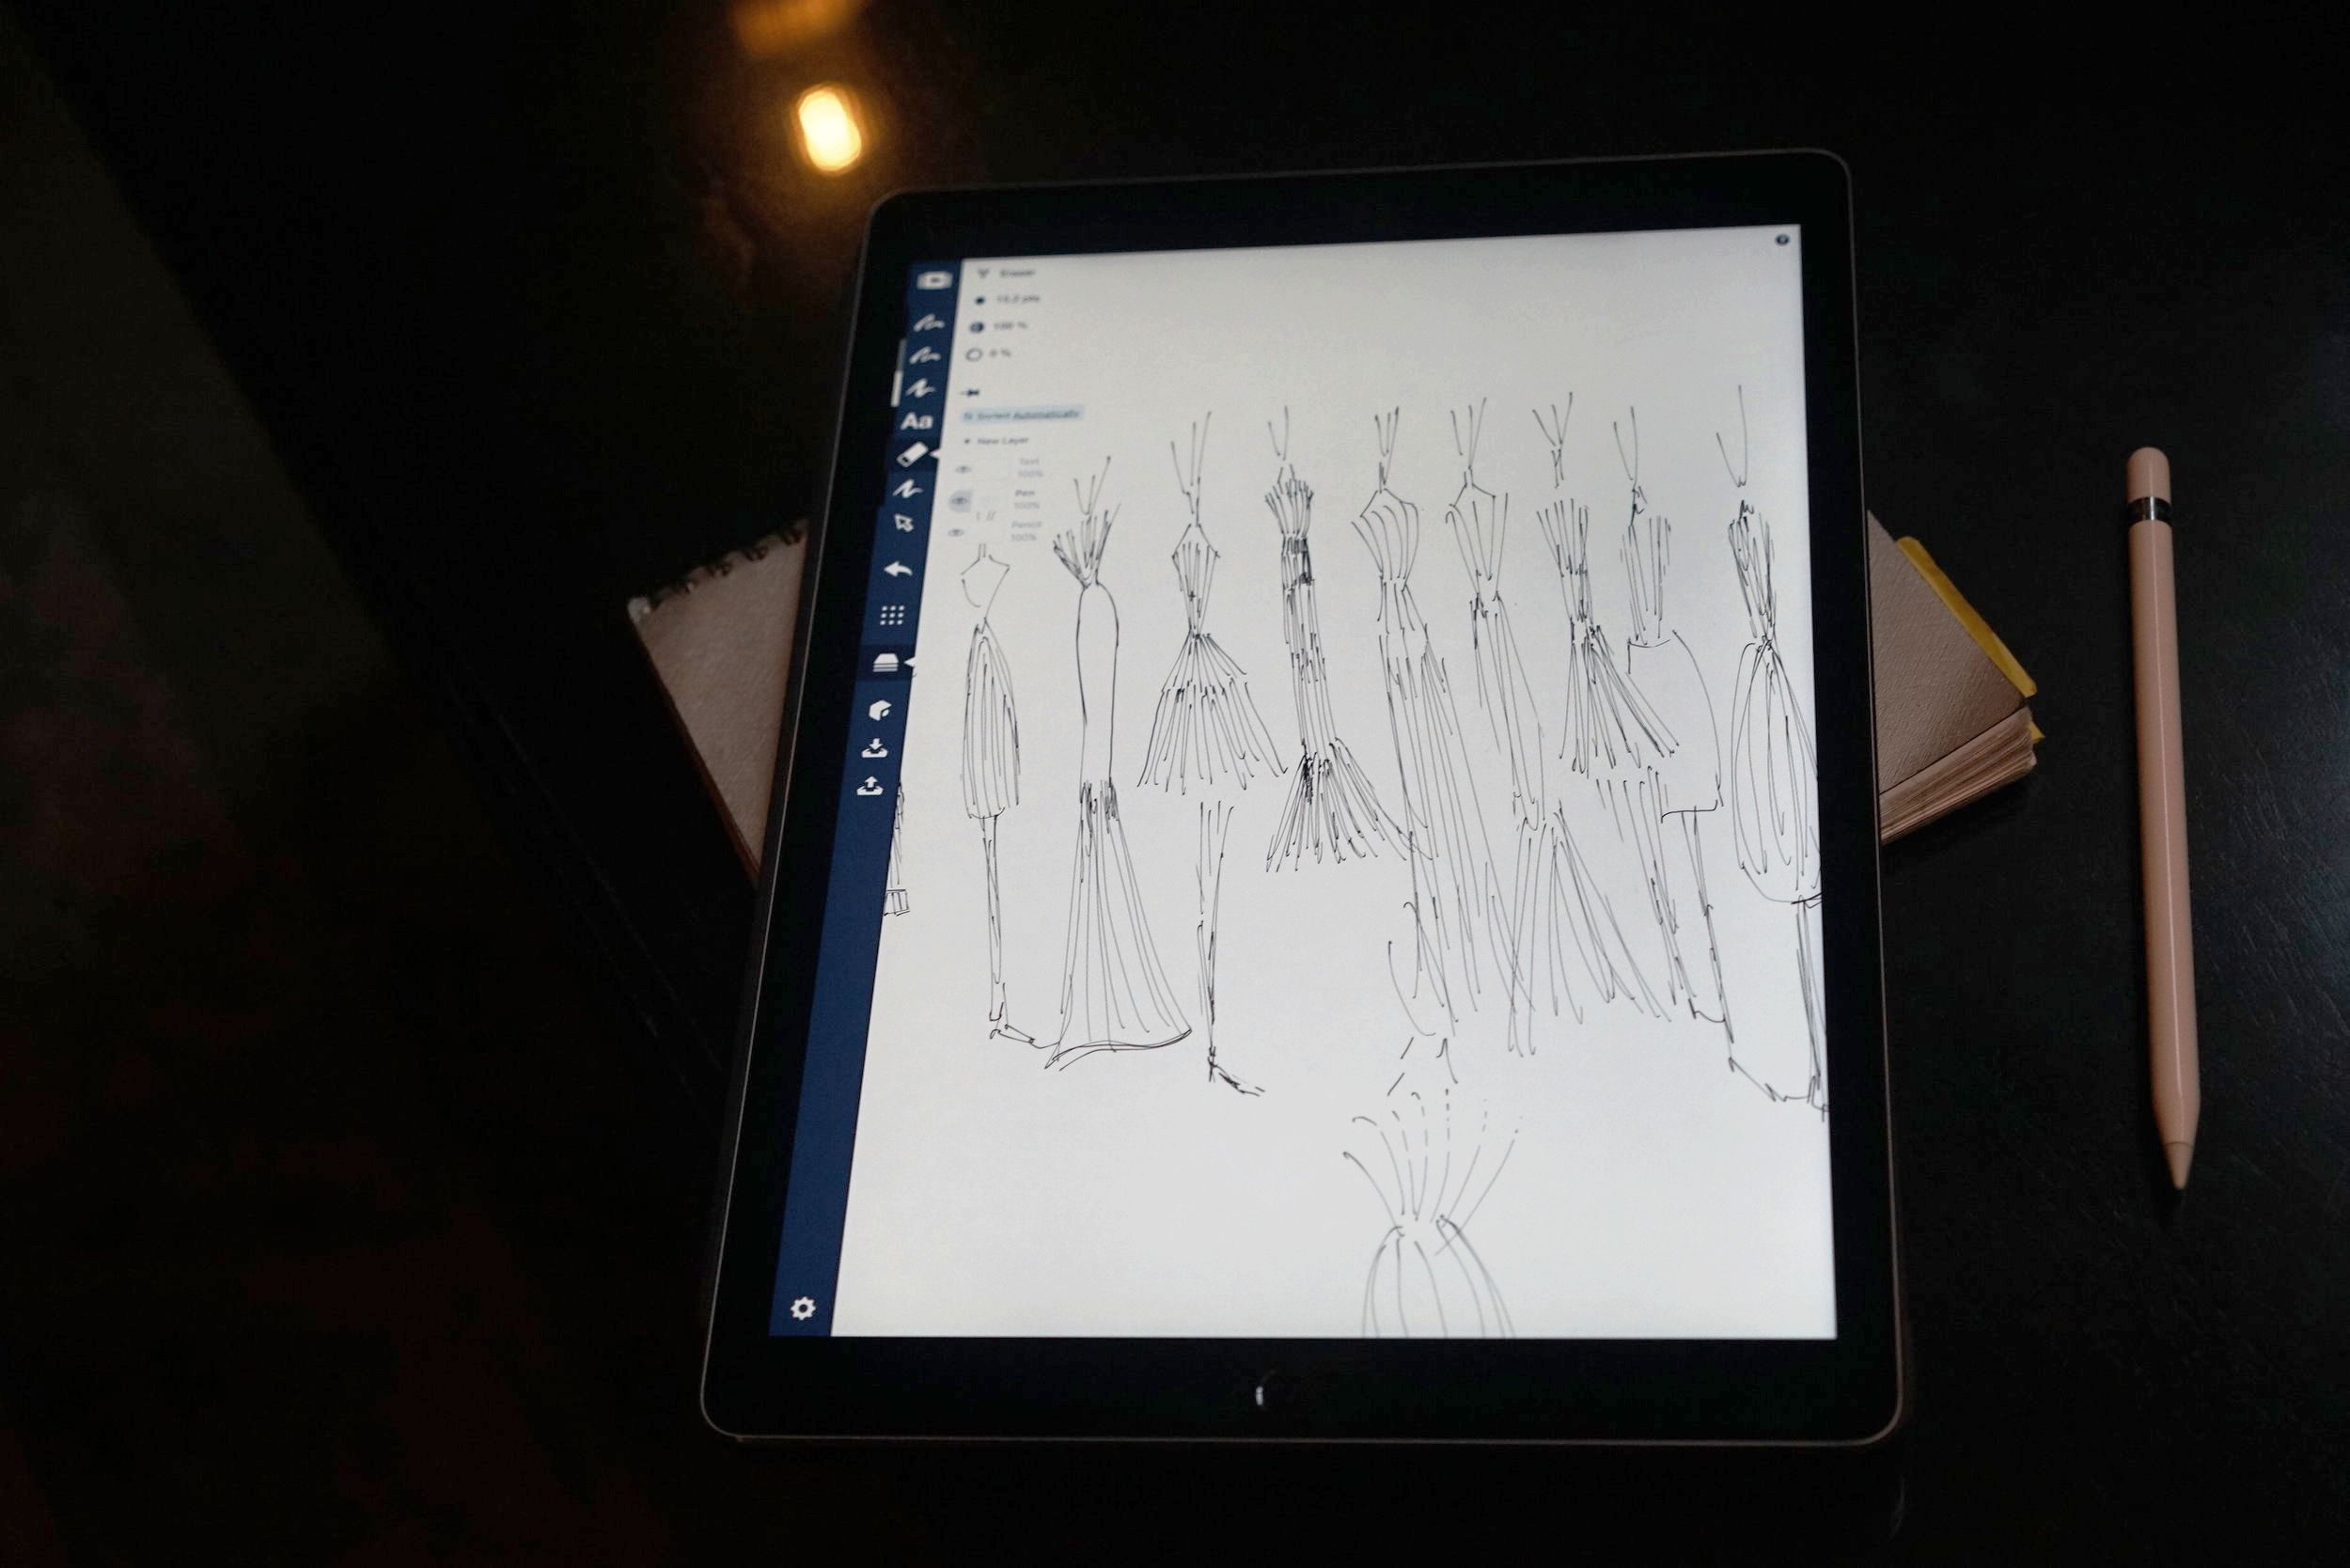 christine_the_style_d_affaire_interview_oscar_juarez_new_york_fashion_week_designer_interior_designer_zang_toi.jpeg